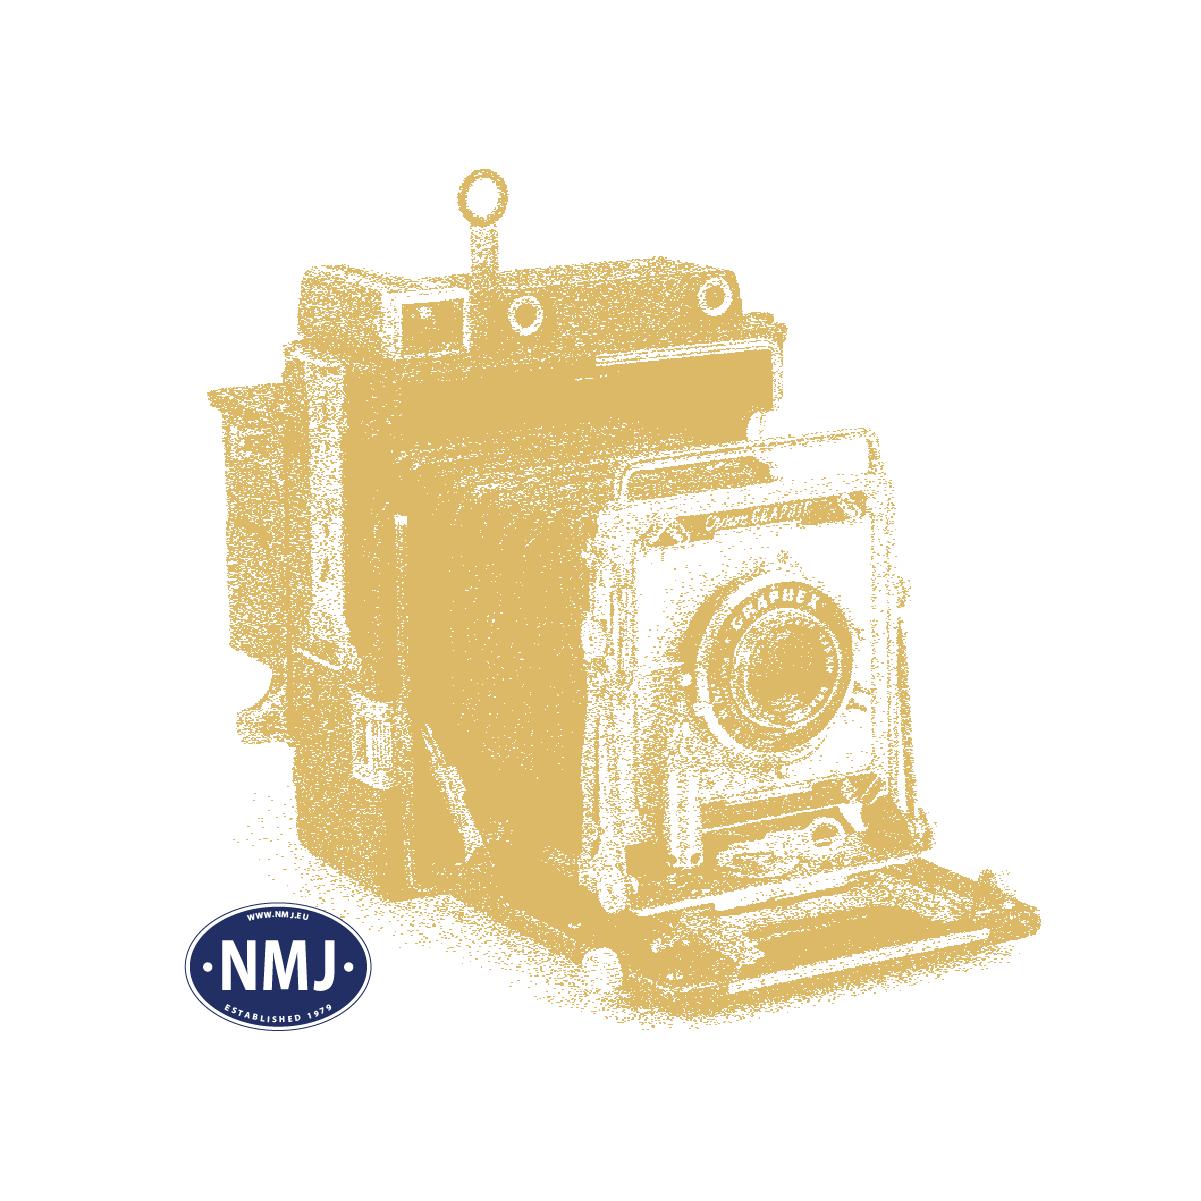 NMJT504.103 - NMJ Topline NSB His 210 2 198-9